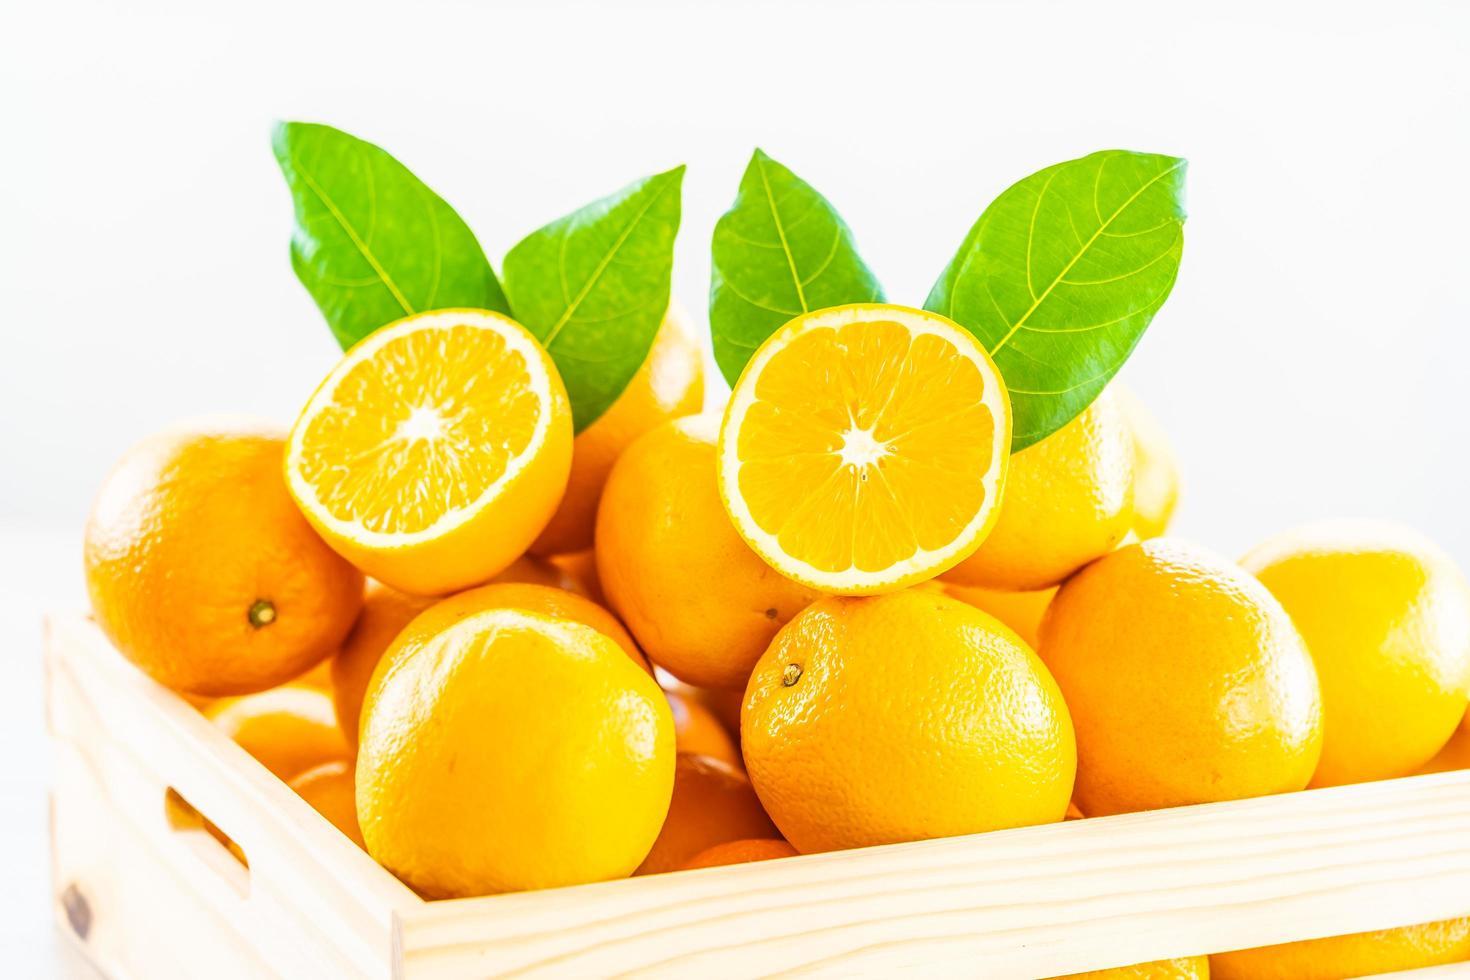 naranjas frescas en una caja de madera foto